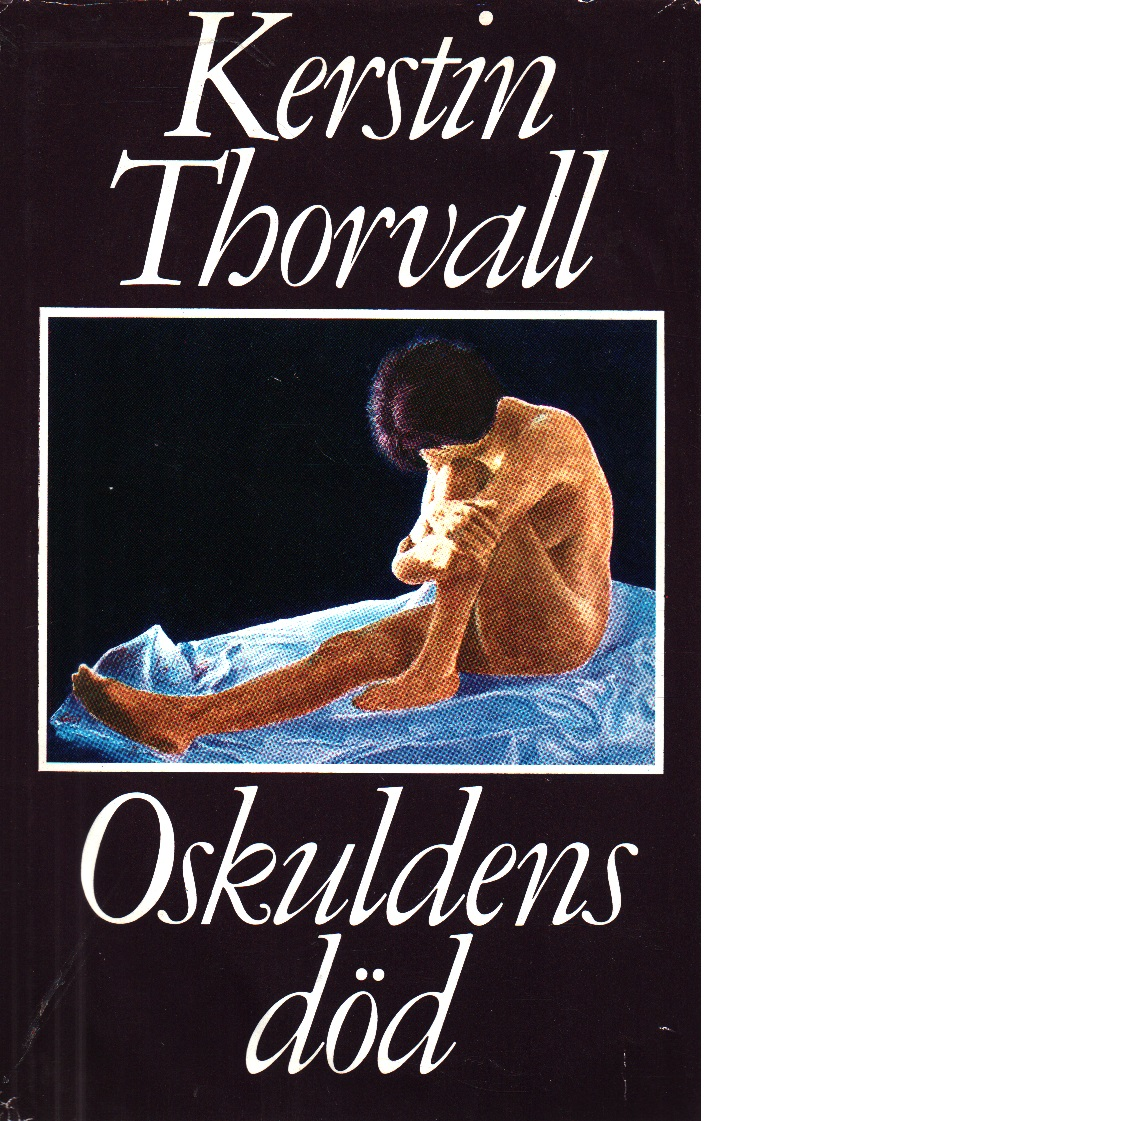 Oskuldens död - Thorvall, Kerstin